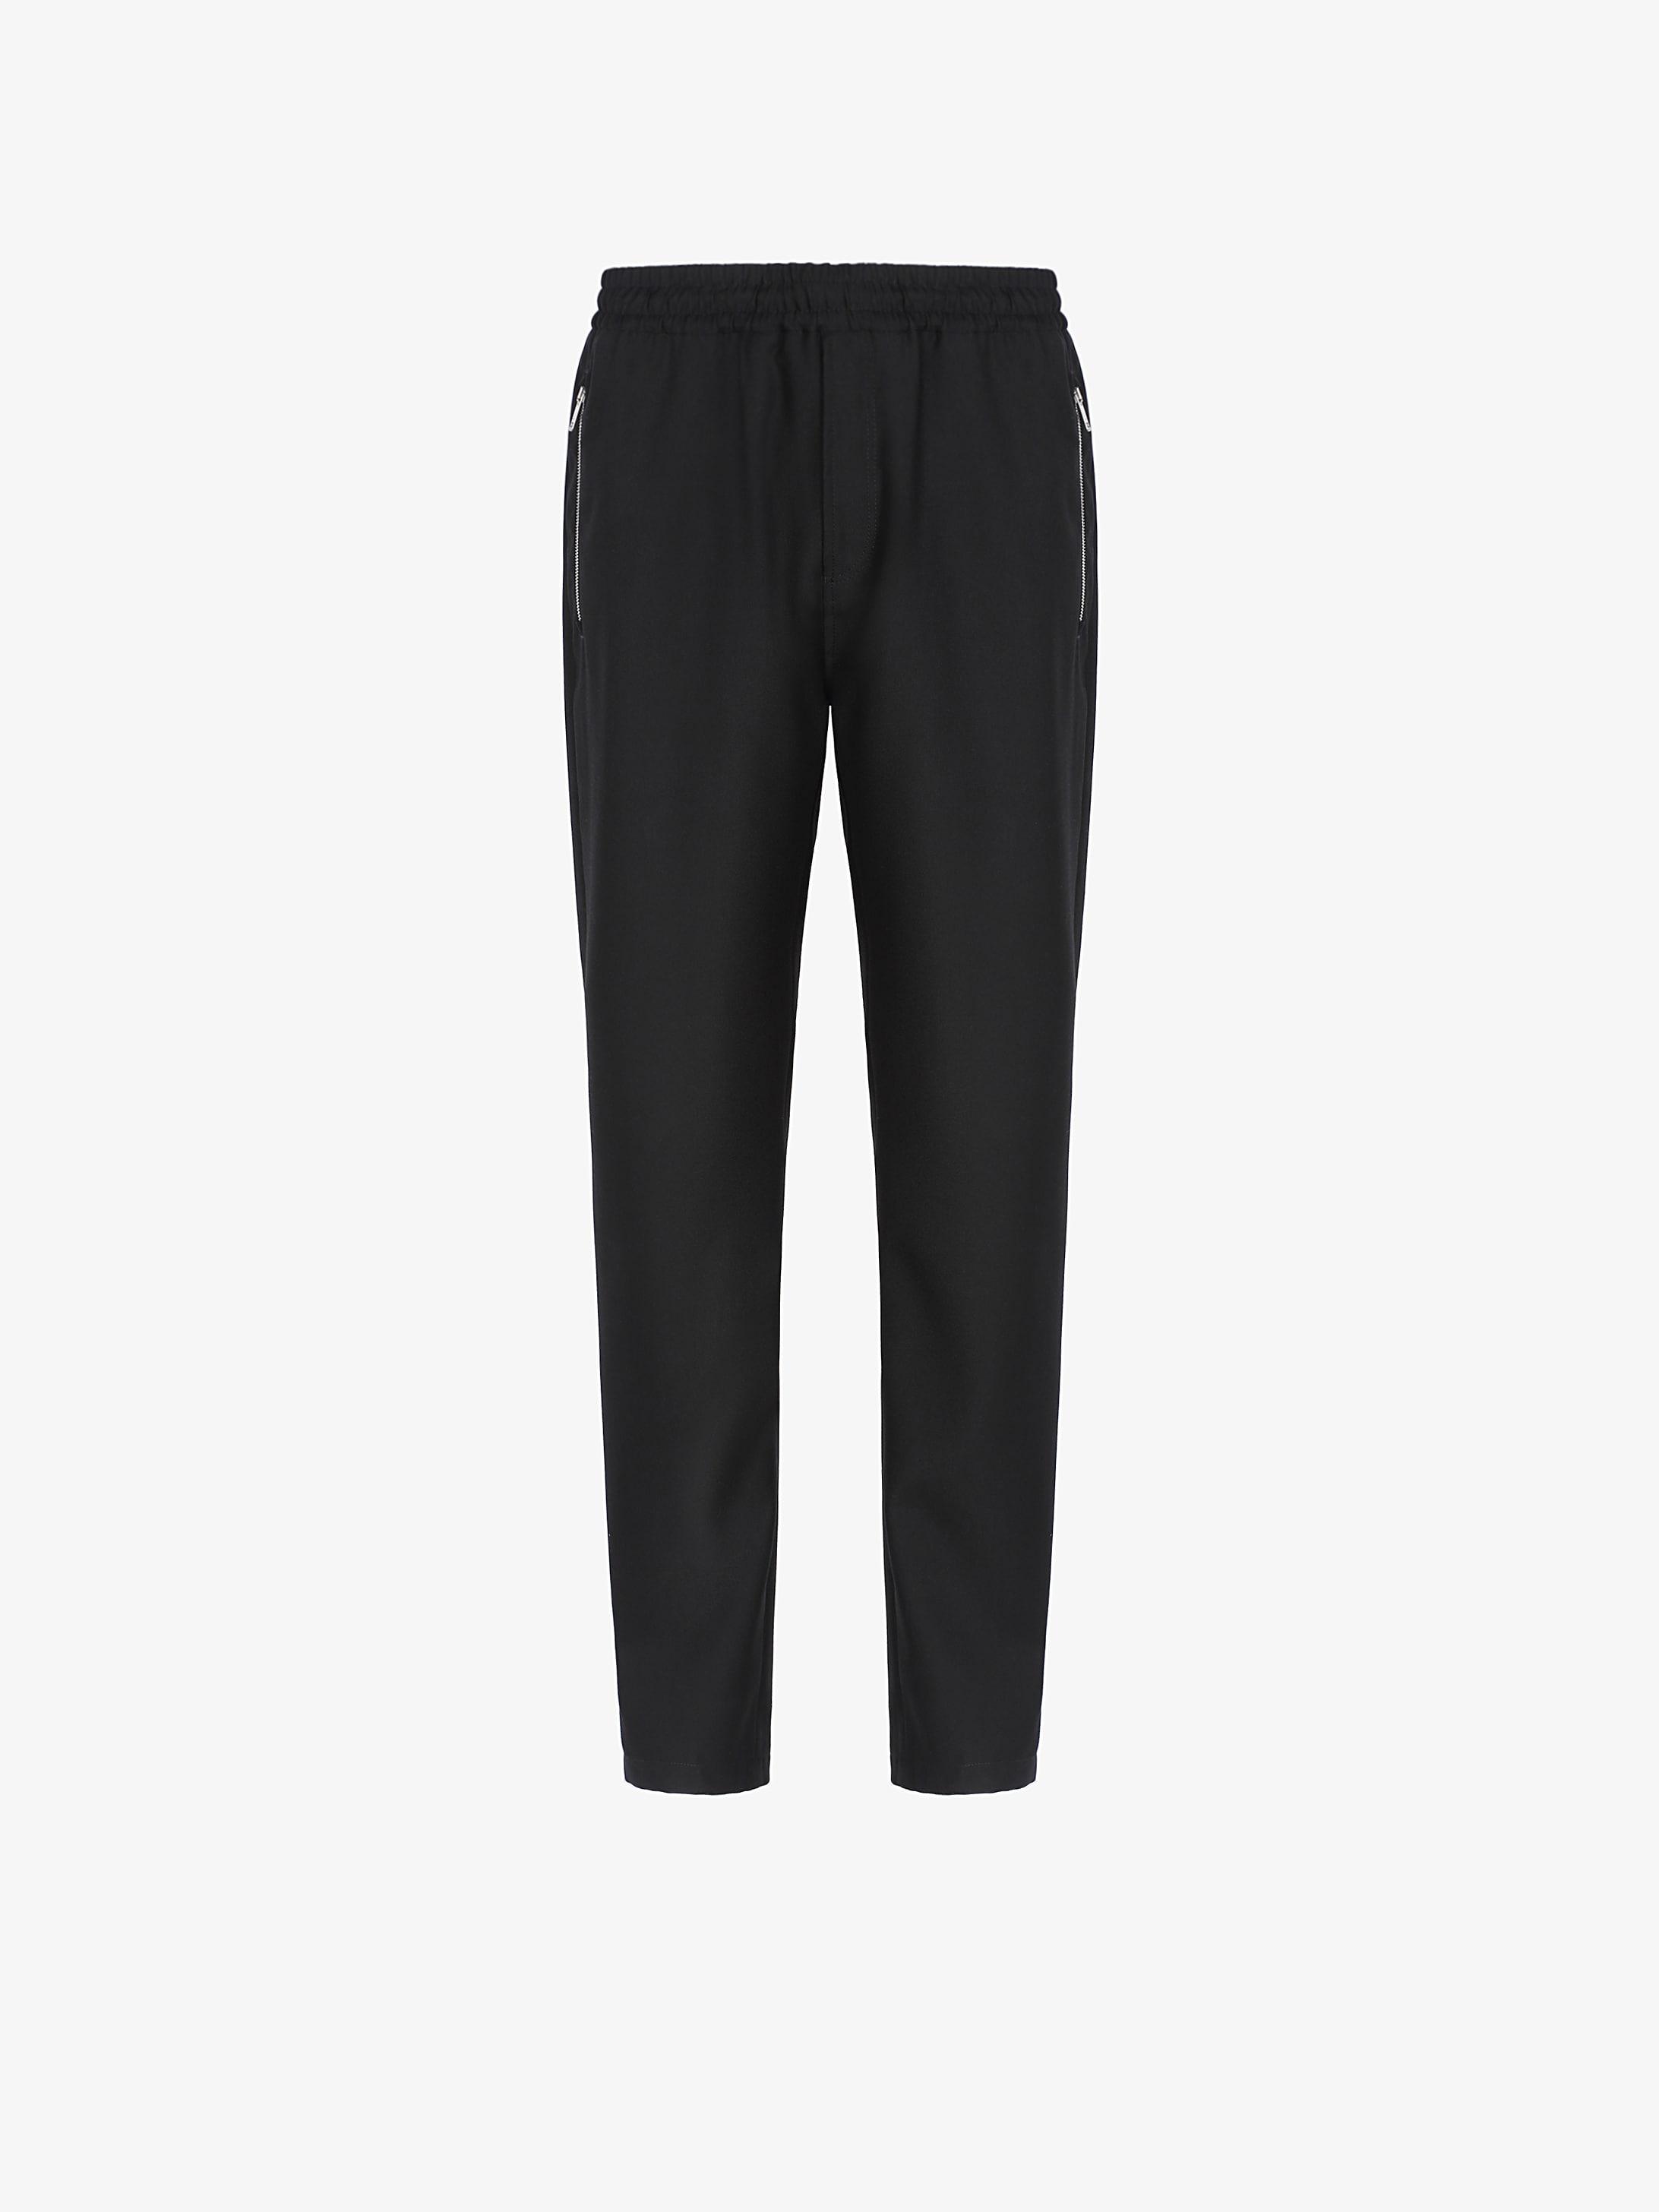 GIVENCHY ADDRESS jogger pants in nylon